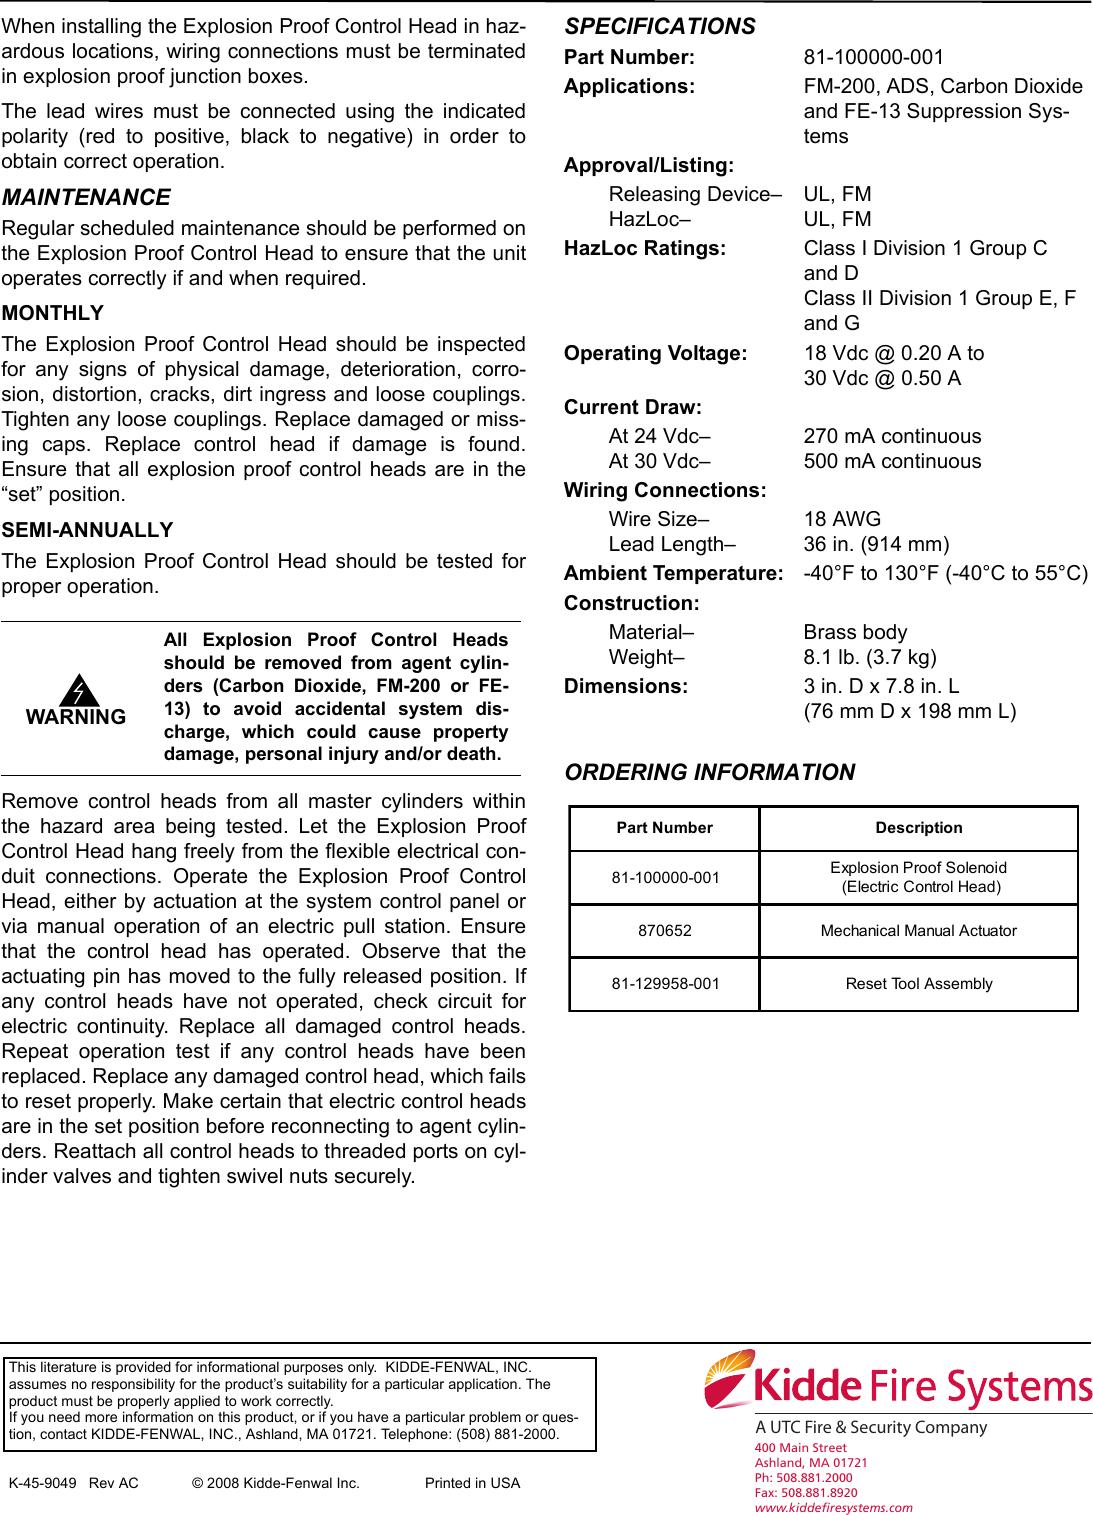 Kidde Fire Systems Smoke Alarm K 45 9049 Users Manual